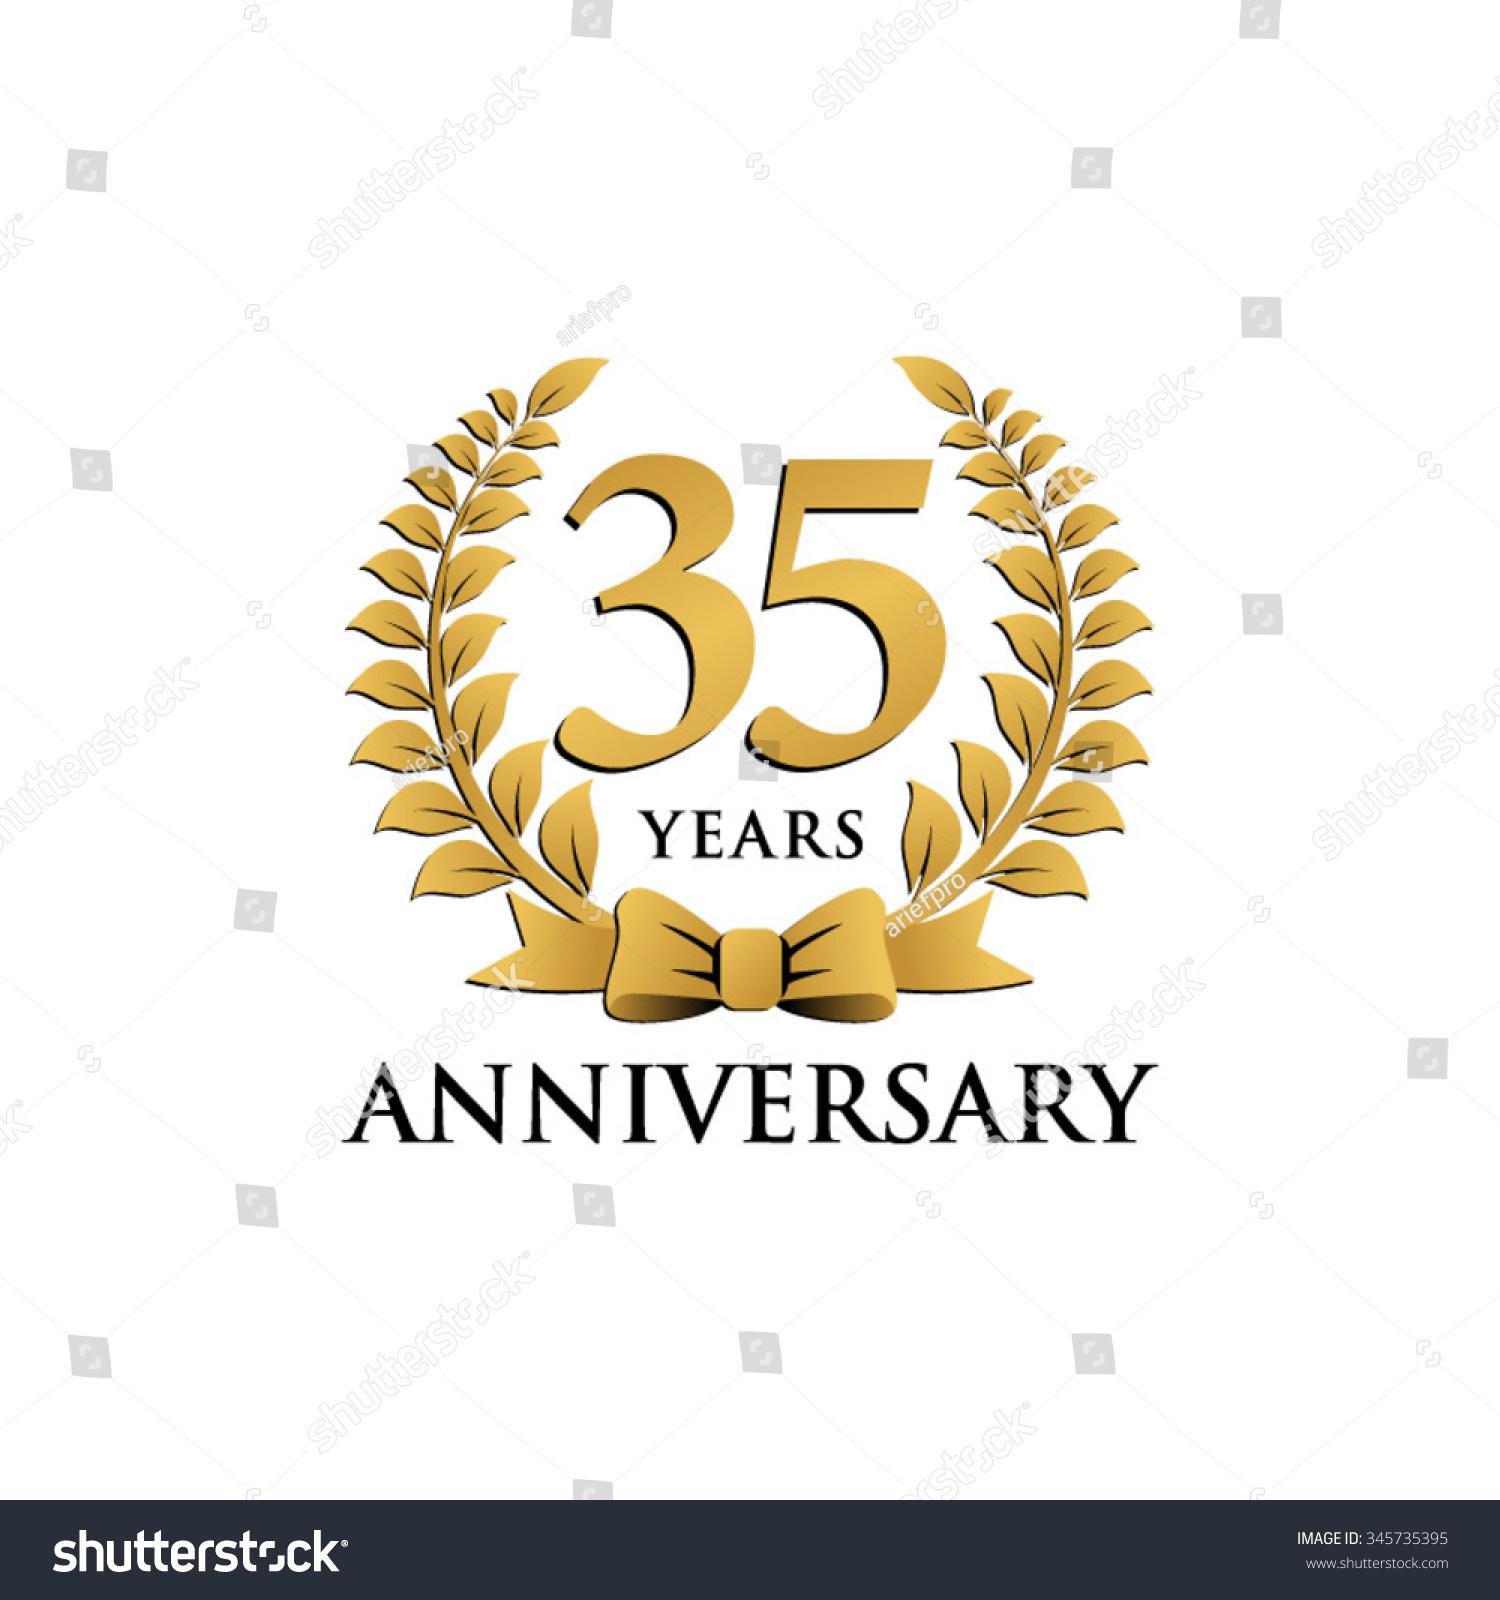 35 Years Anniversary Wreath Ribbon Logo Stock Vector Royalty Free